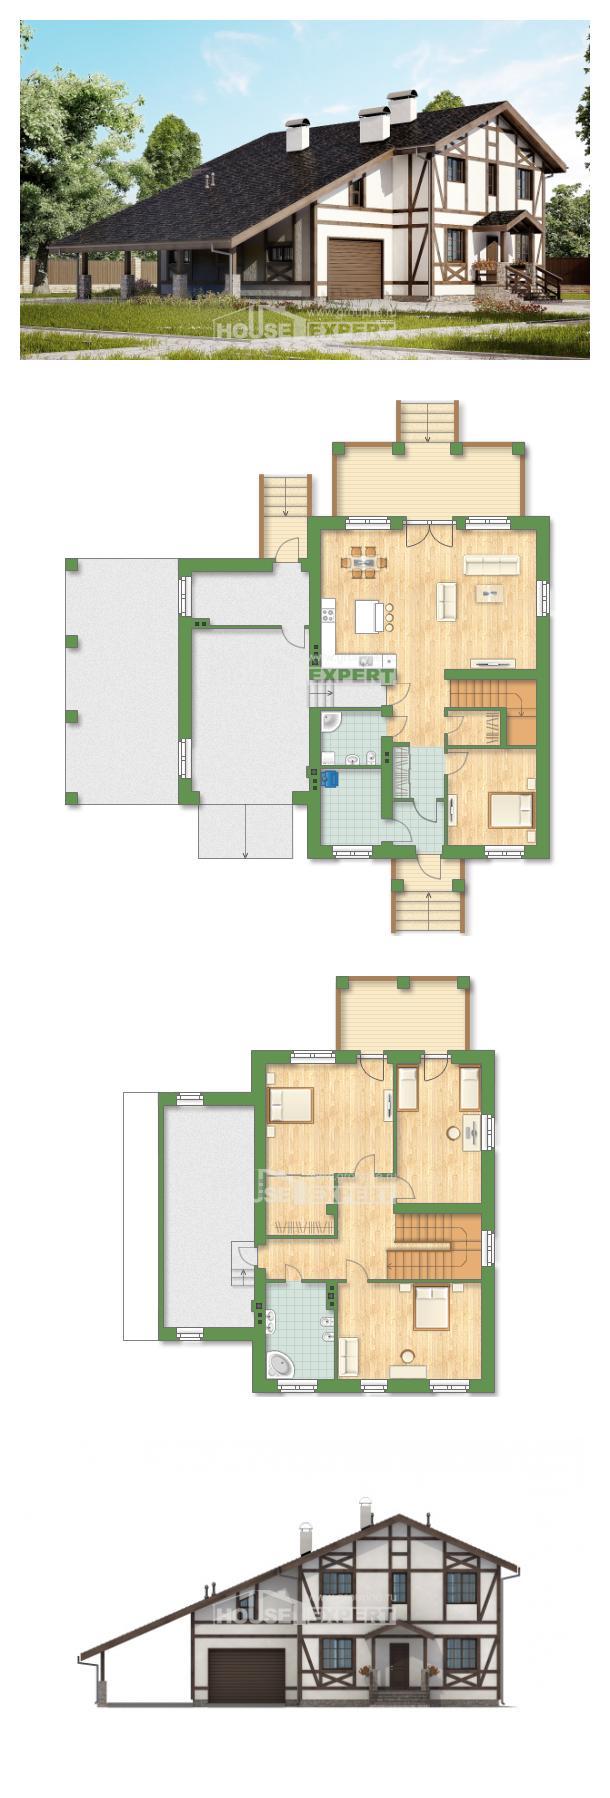 Projekt domu 250-002-L | House Expert